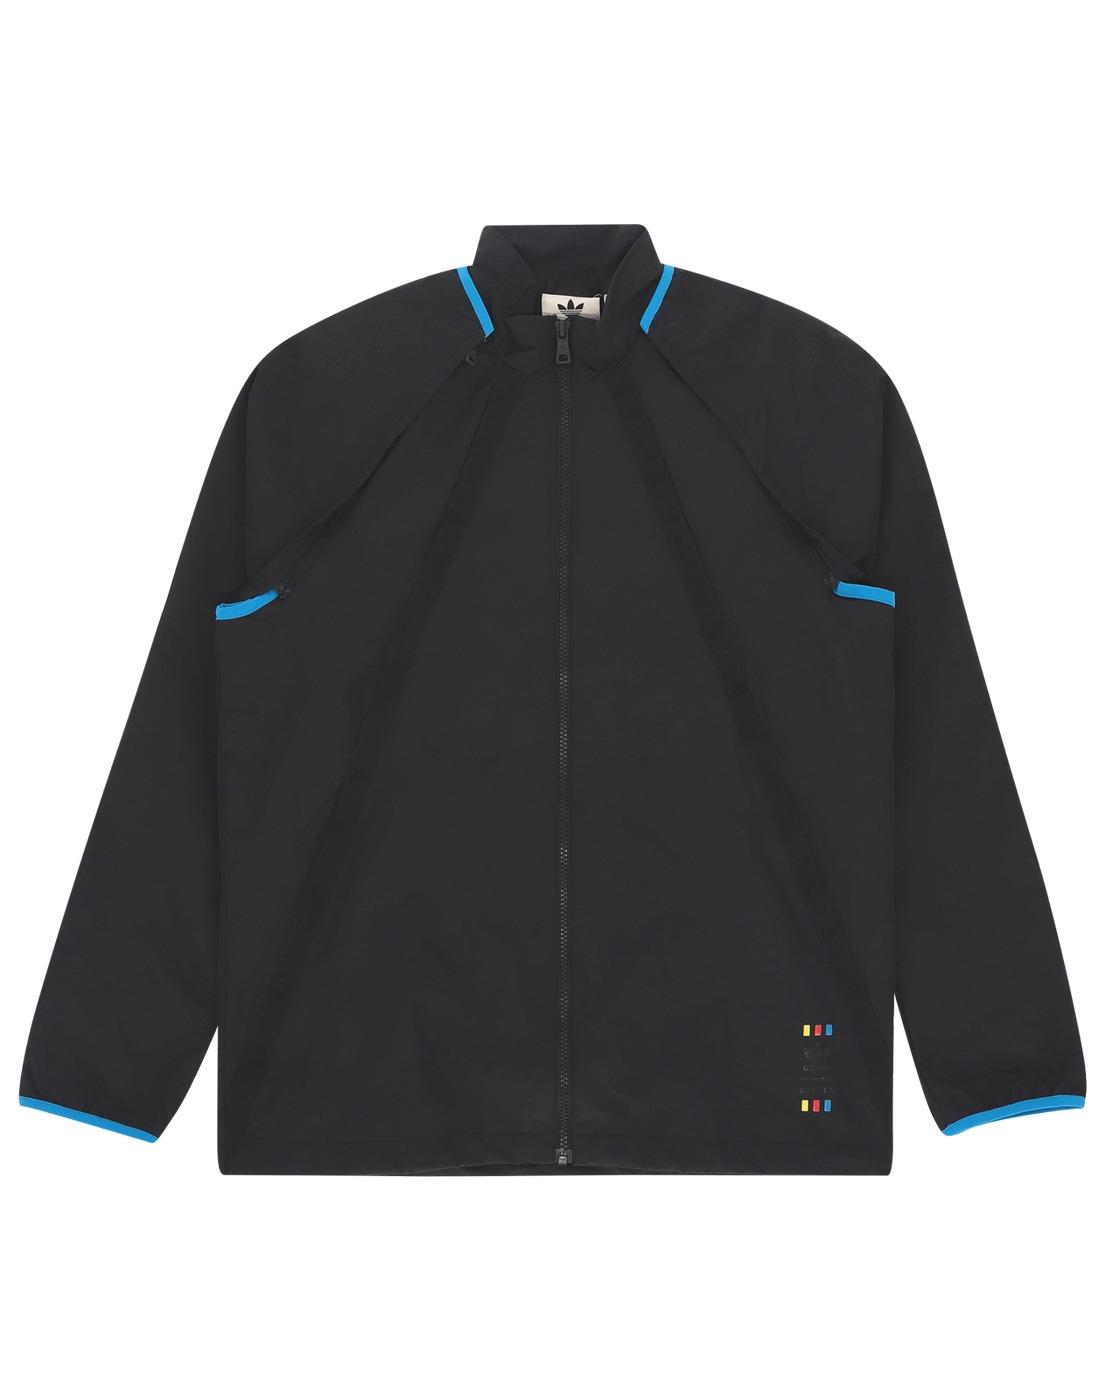 Adidas Originals Adidas X Oyster 48 Hours Jacket Black/Black